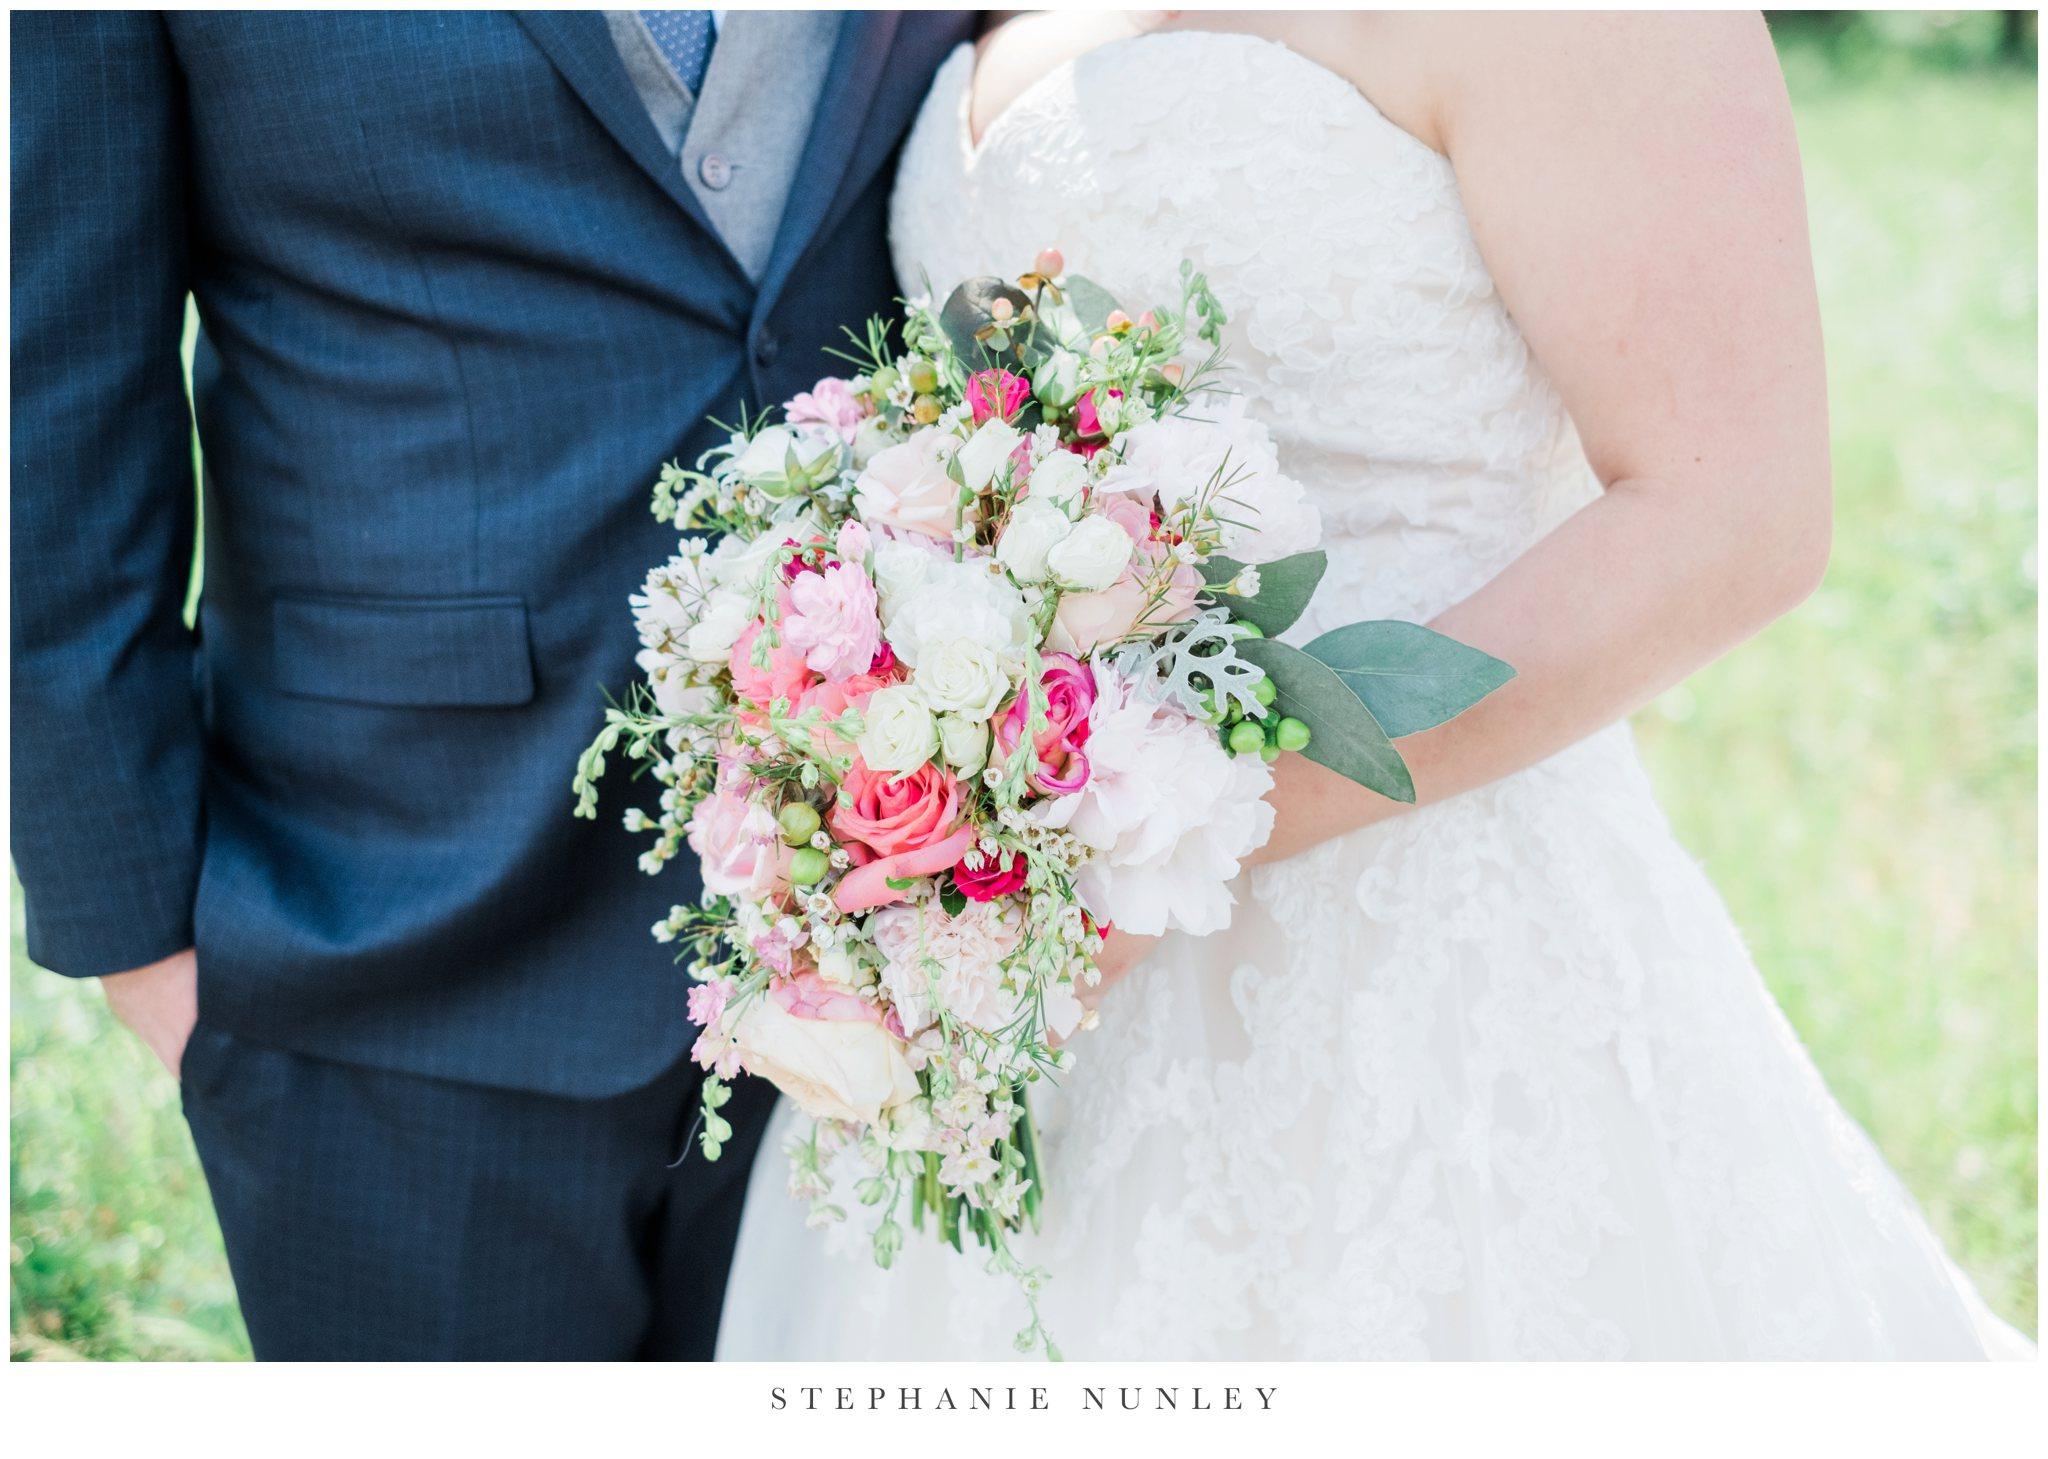 romantic-outdoor-wedding-with-flower-crown-0072.jpg